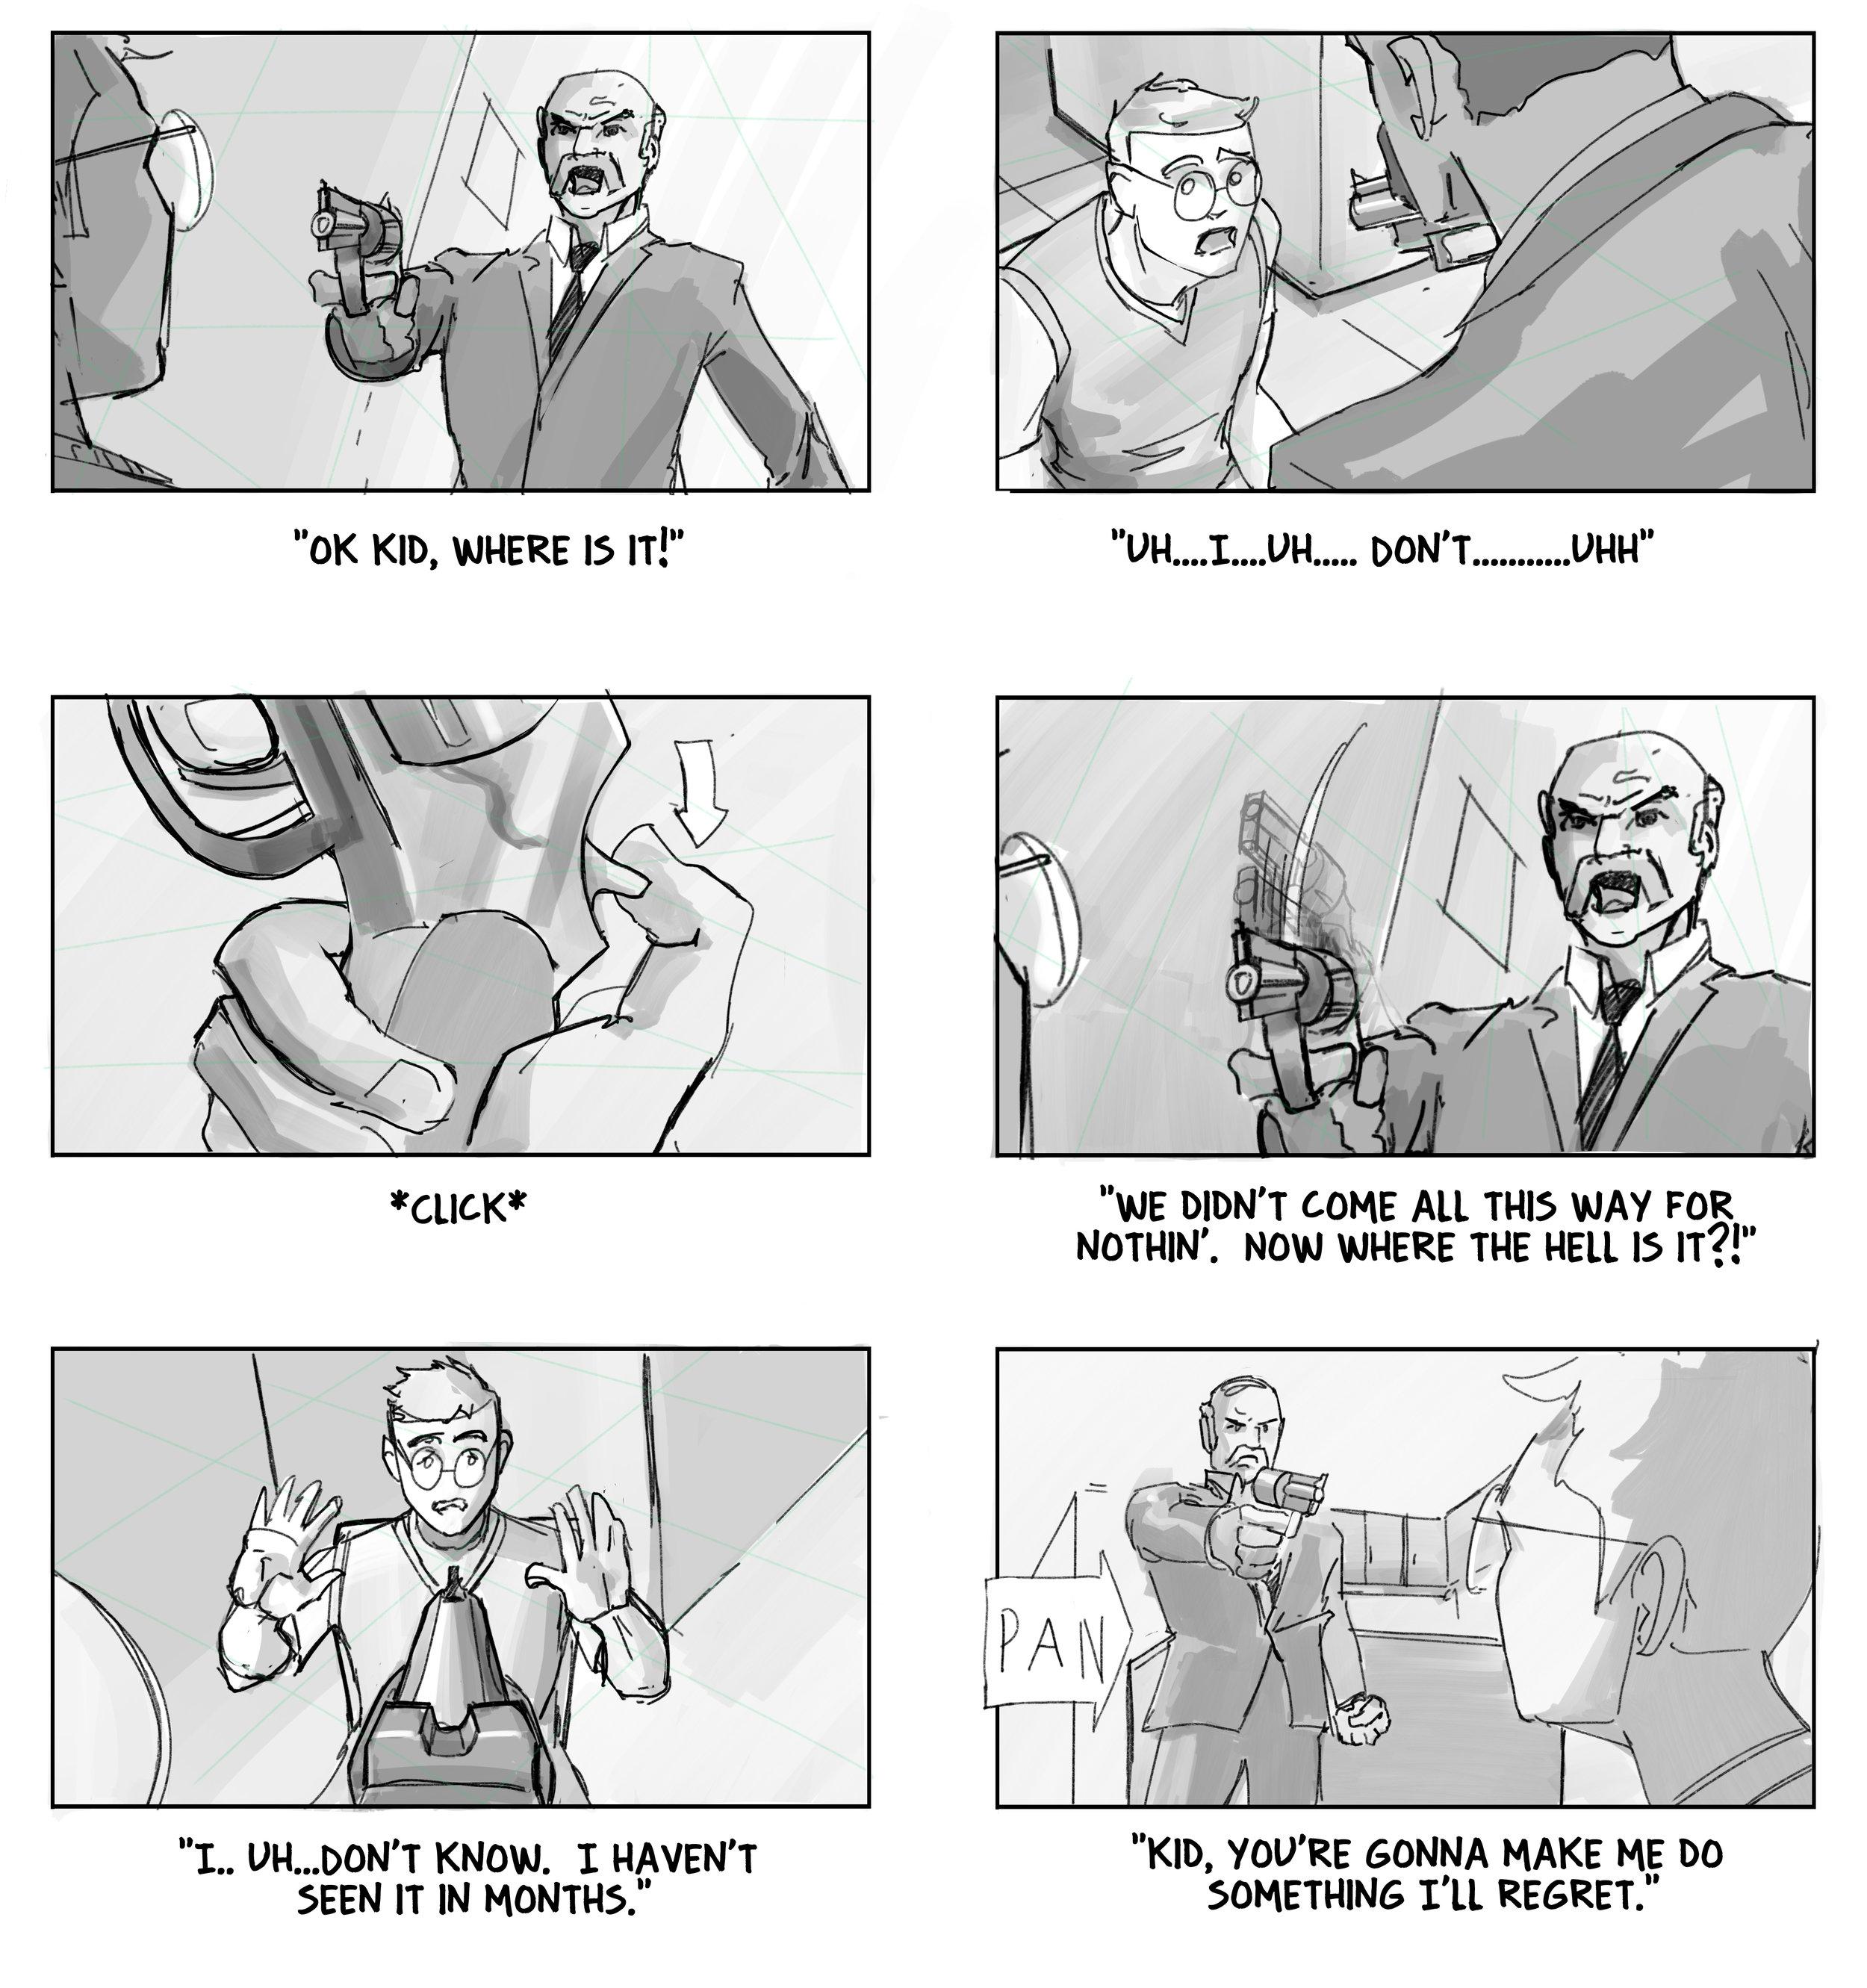 SAM_BS_Catapano_Storyboards_005.jpg